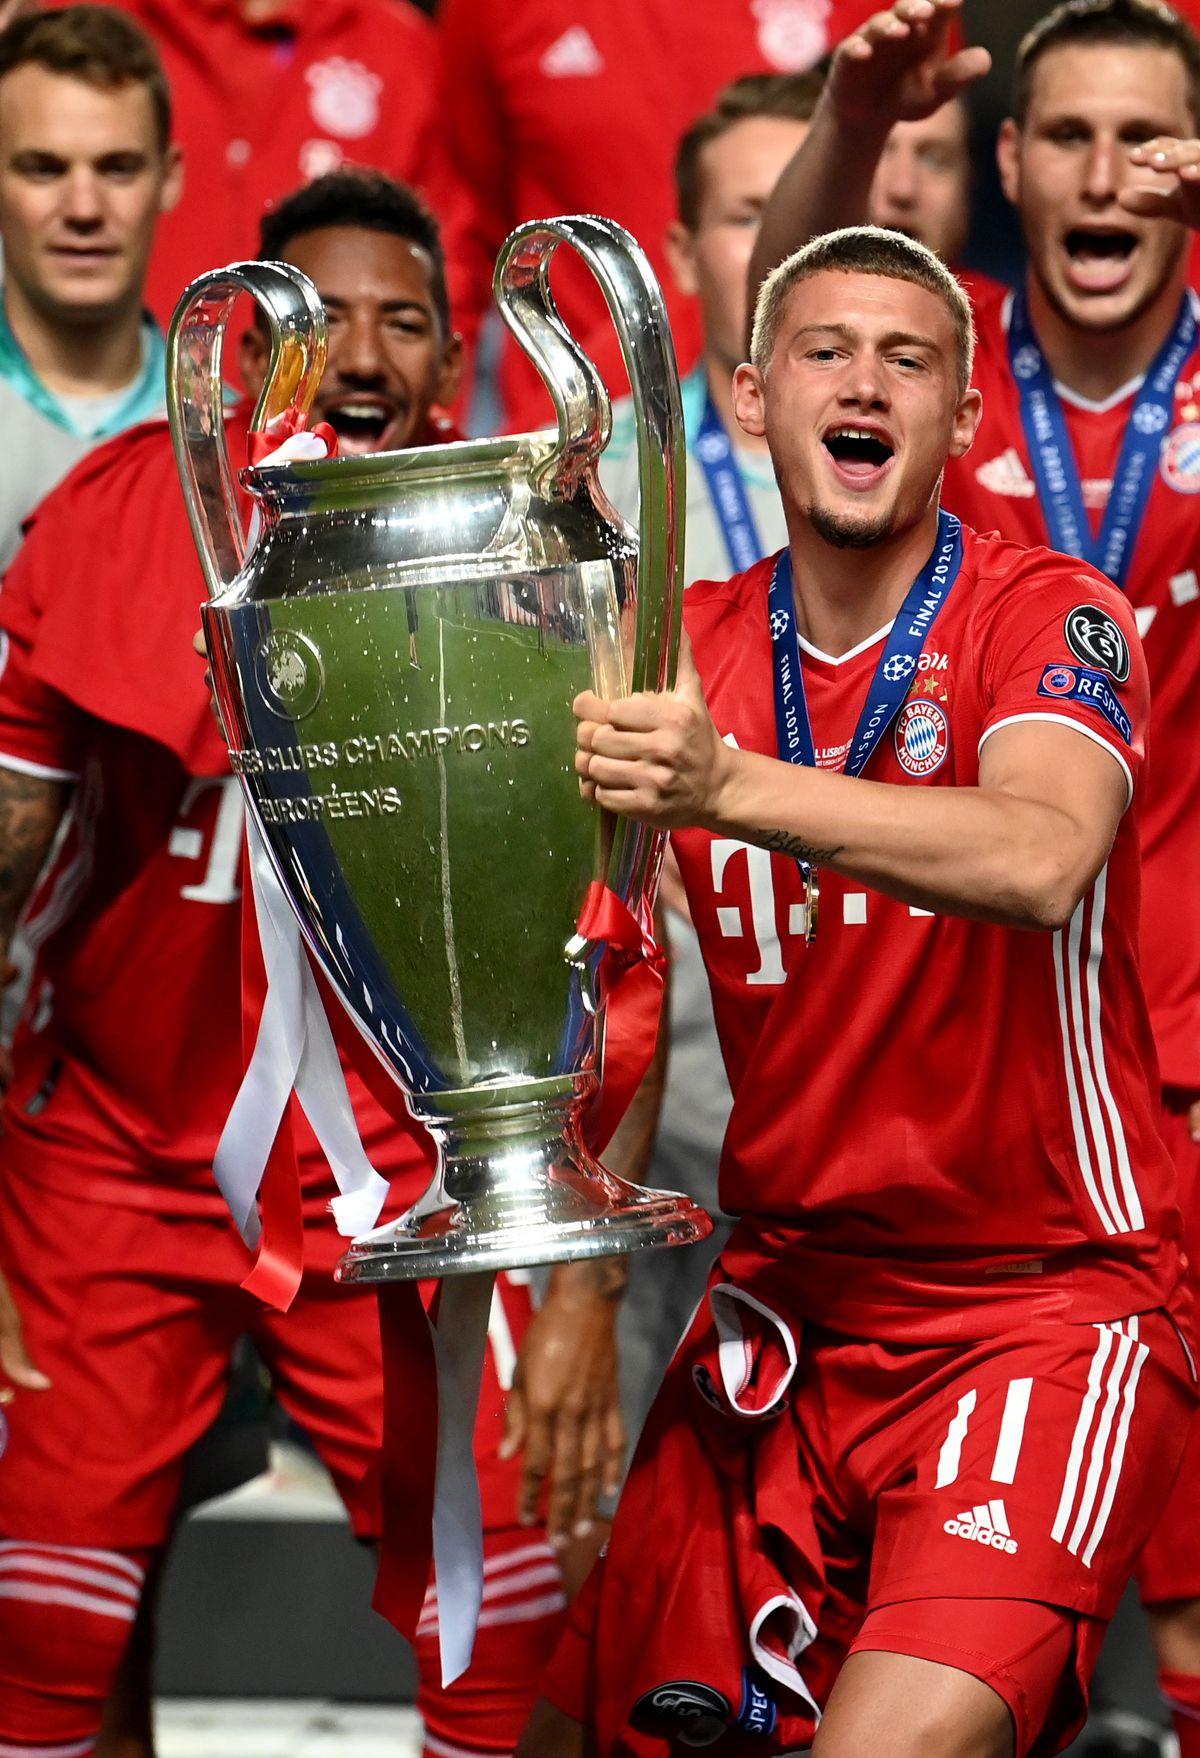 Paris Saint-Germain v Bayern Munich - UEFA Champions League Final